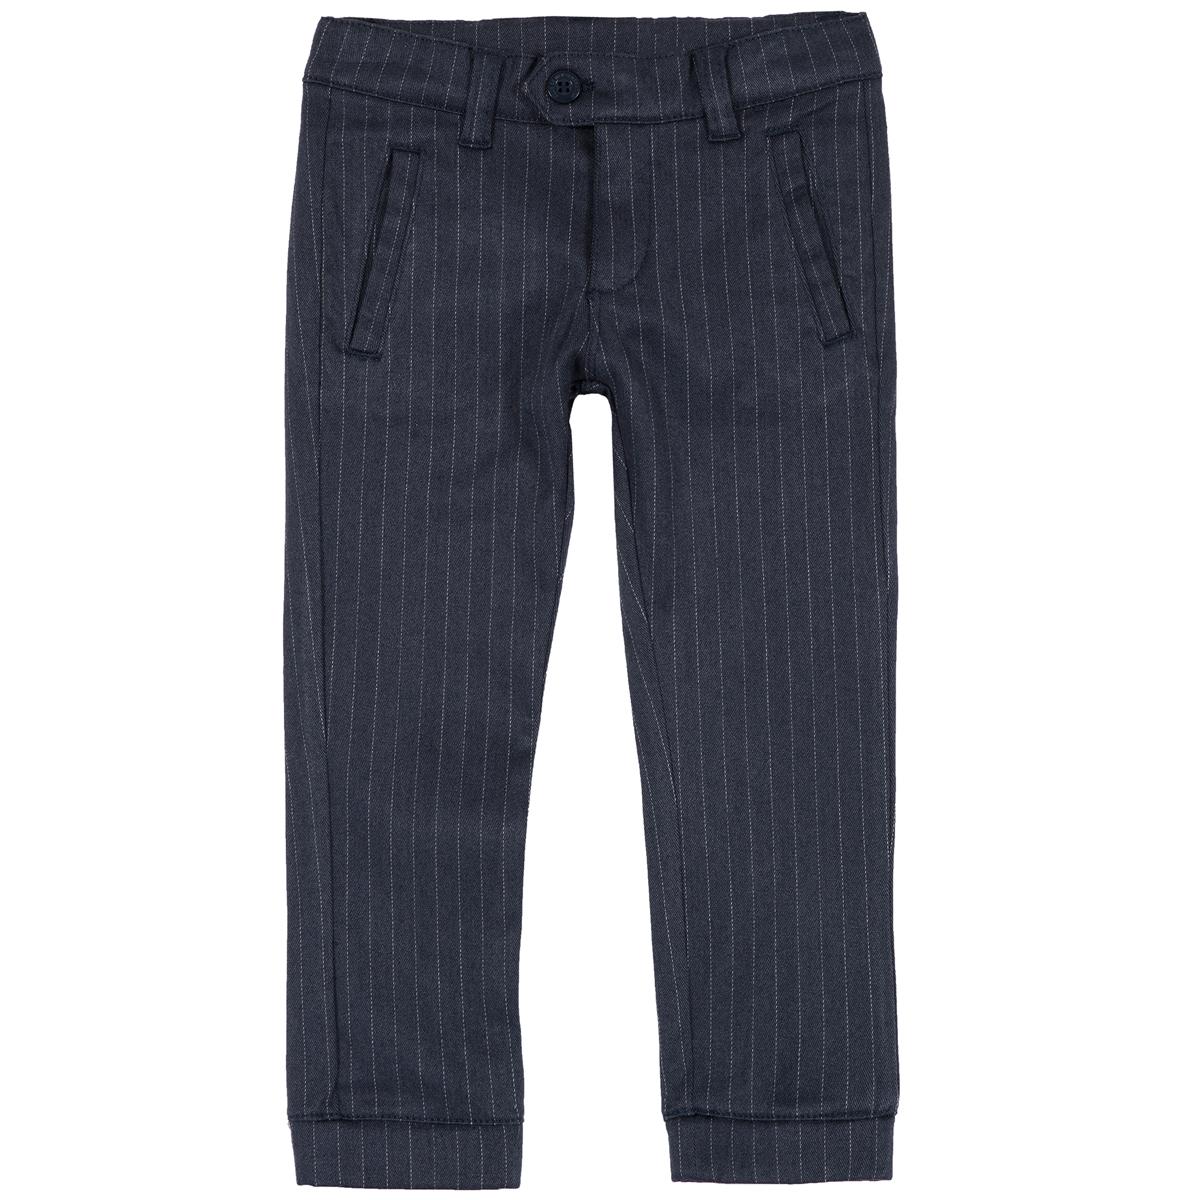 Pantaloni lungi copii Chicco, bleumarin cu dungi albe, 08046 din categoria Pantaloni copii